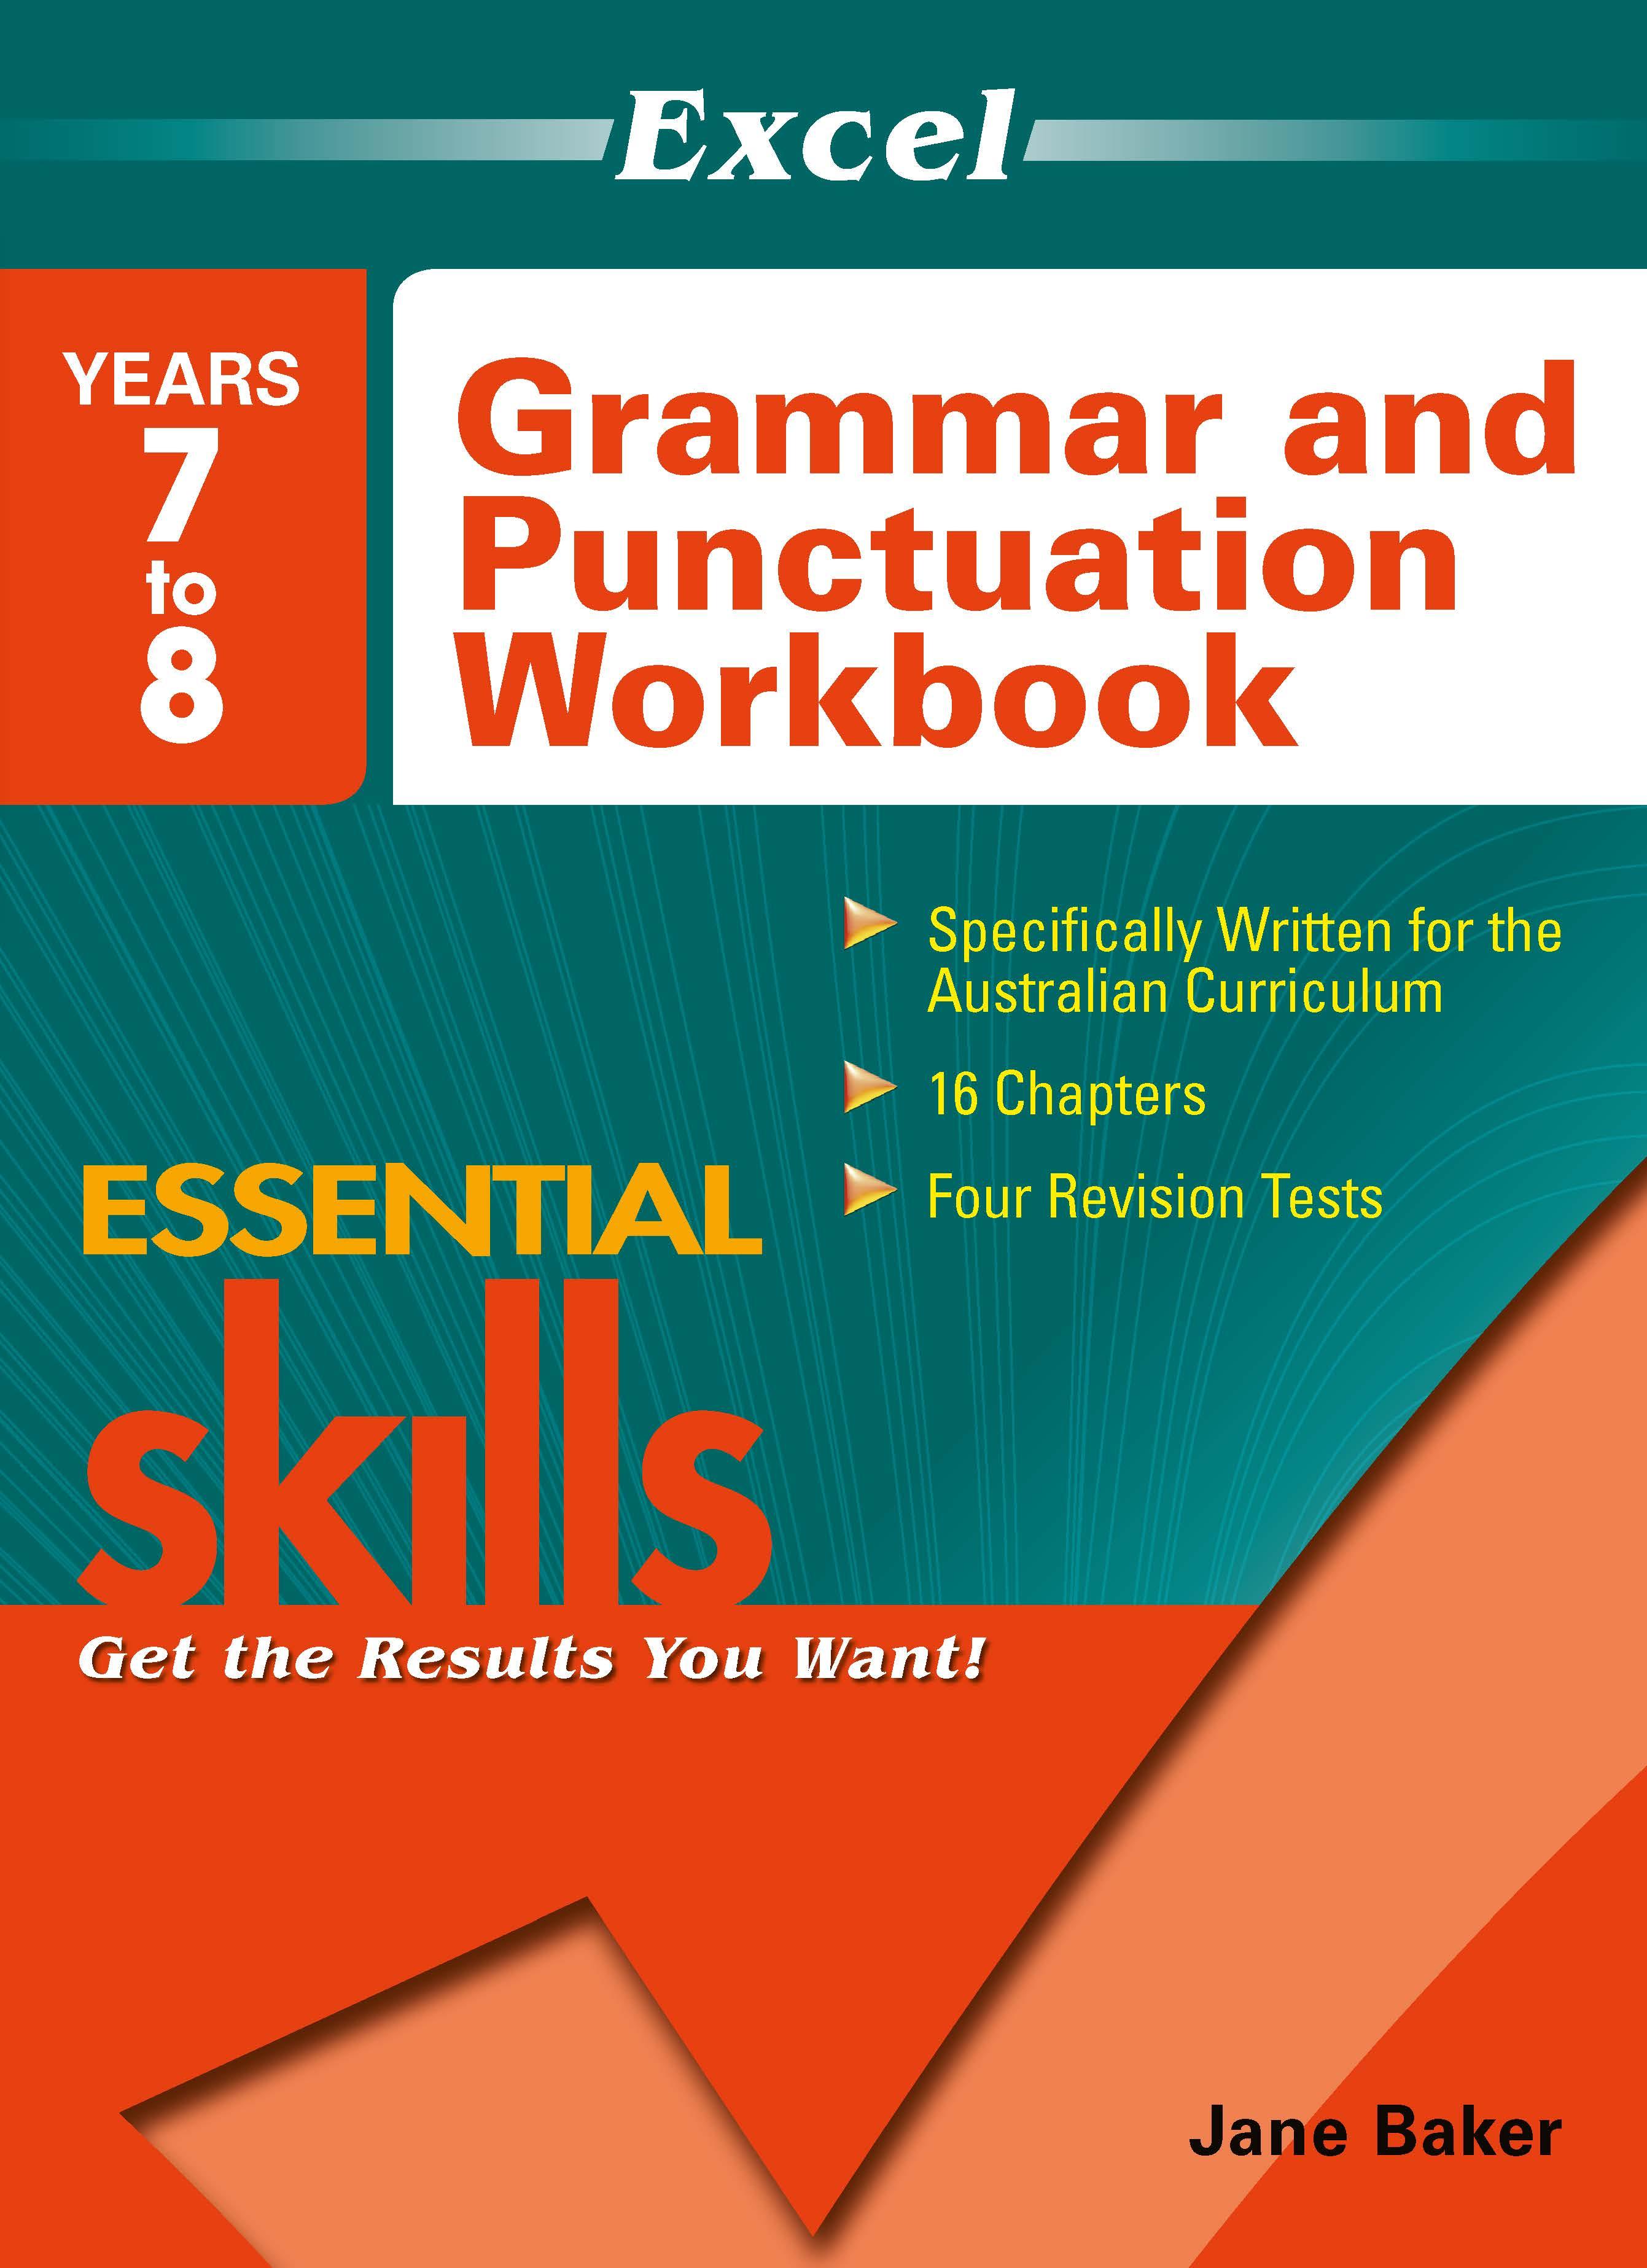 Excel Essential Skills: Grammar and Punctuation Workbook Years 7-8